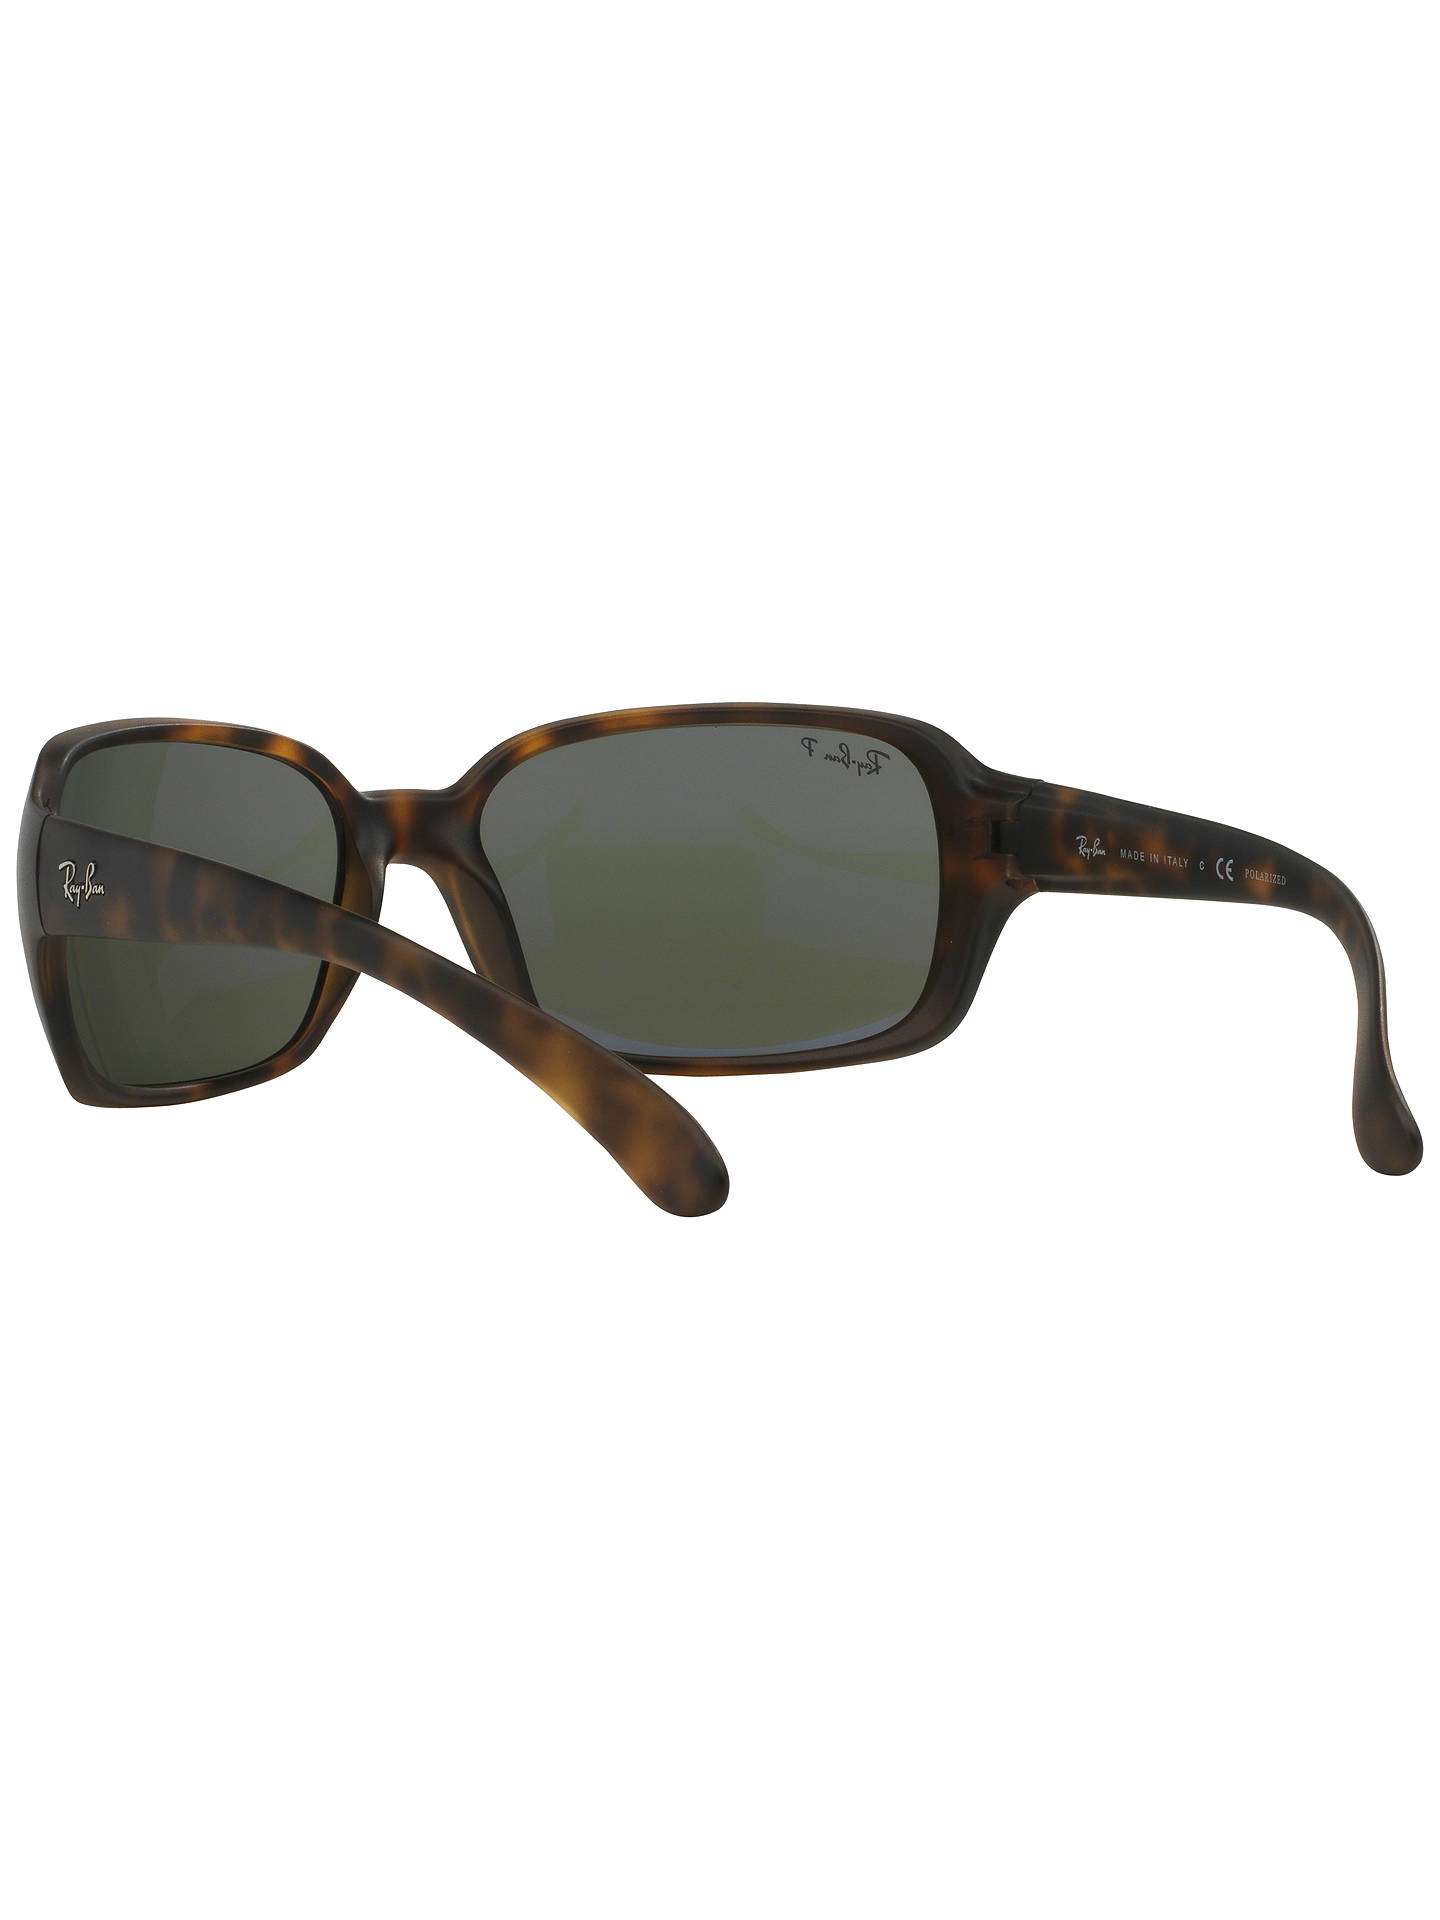 58d43fc235 Ray-Ban RB4068 Polarised Rectangular Sunglasses at John Lewis   Partners